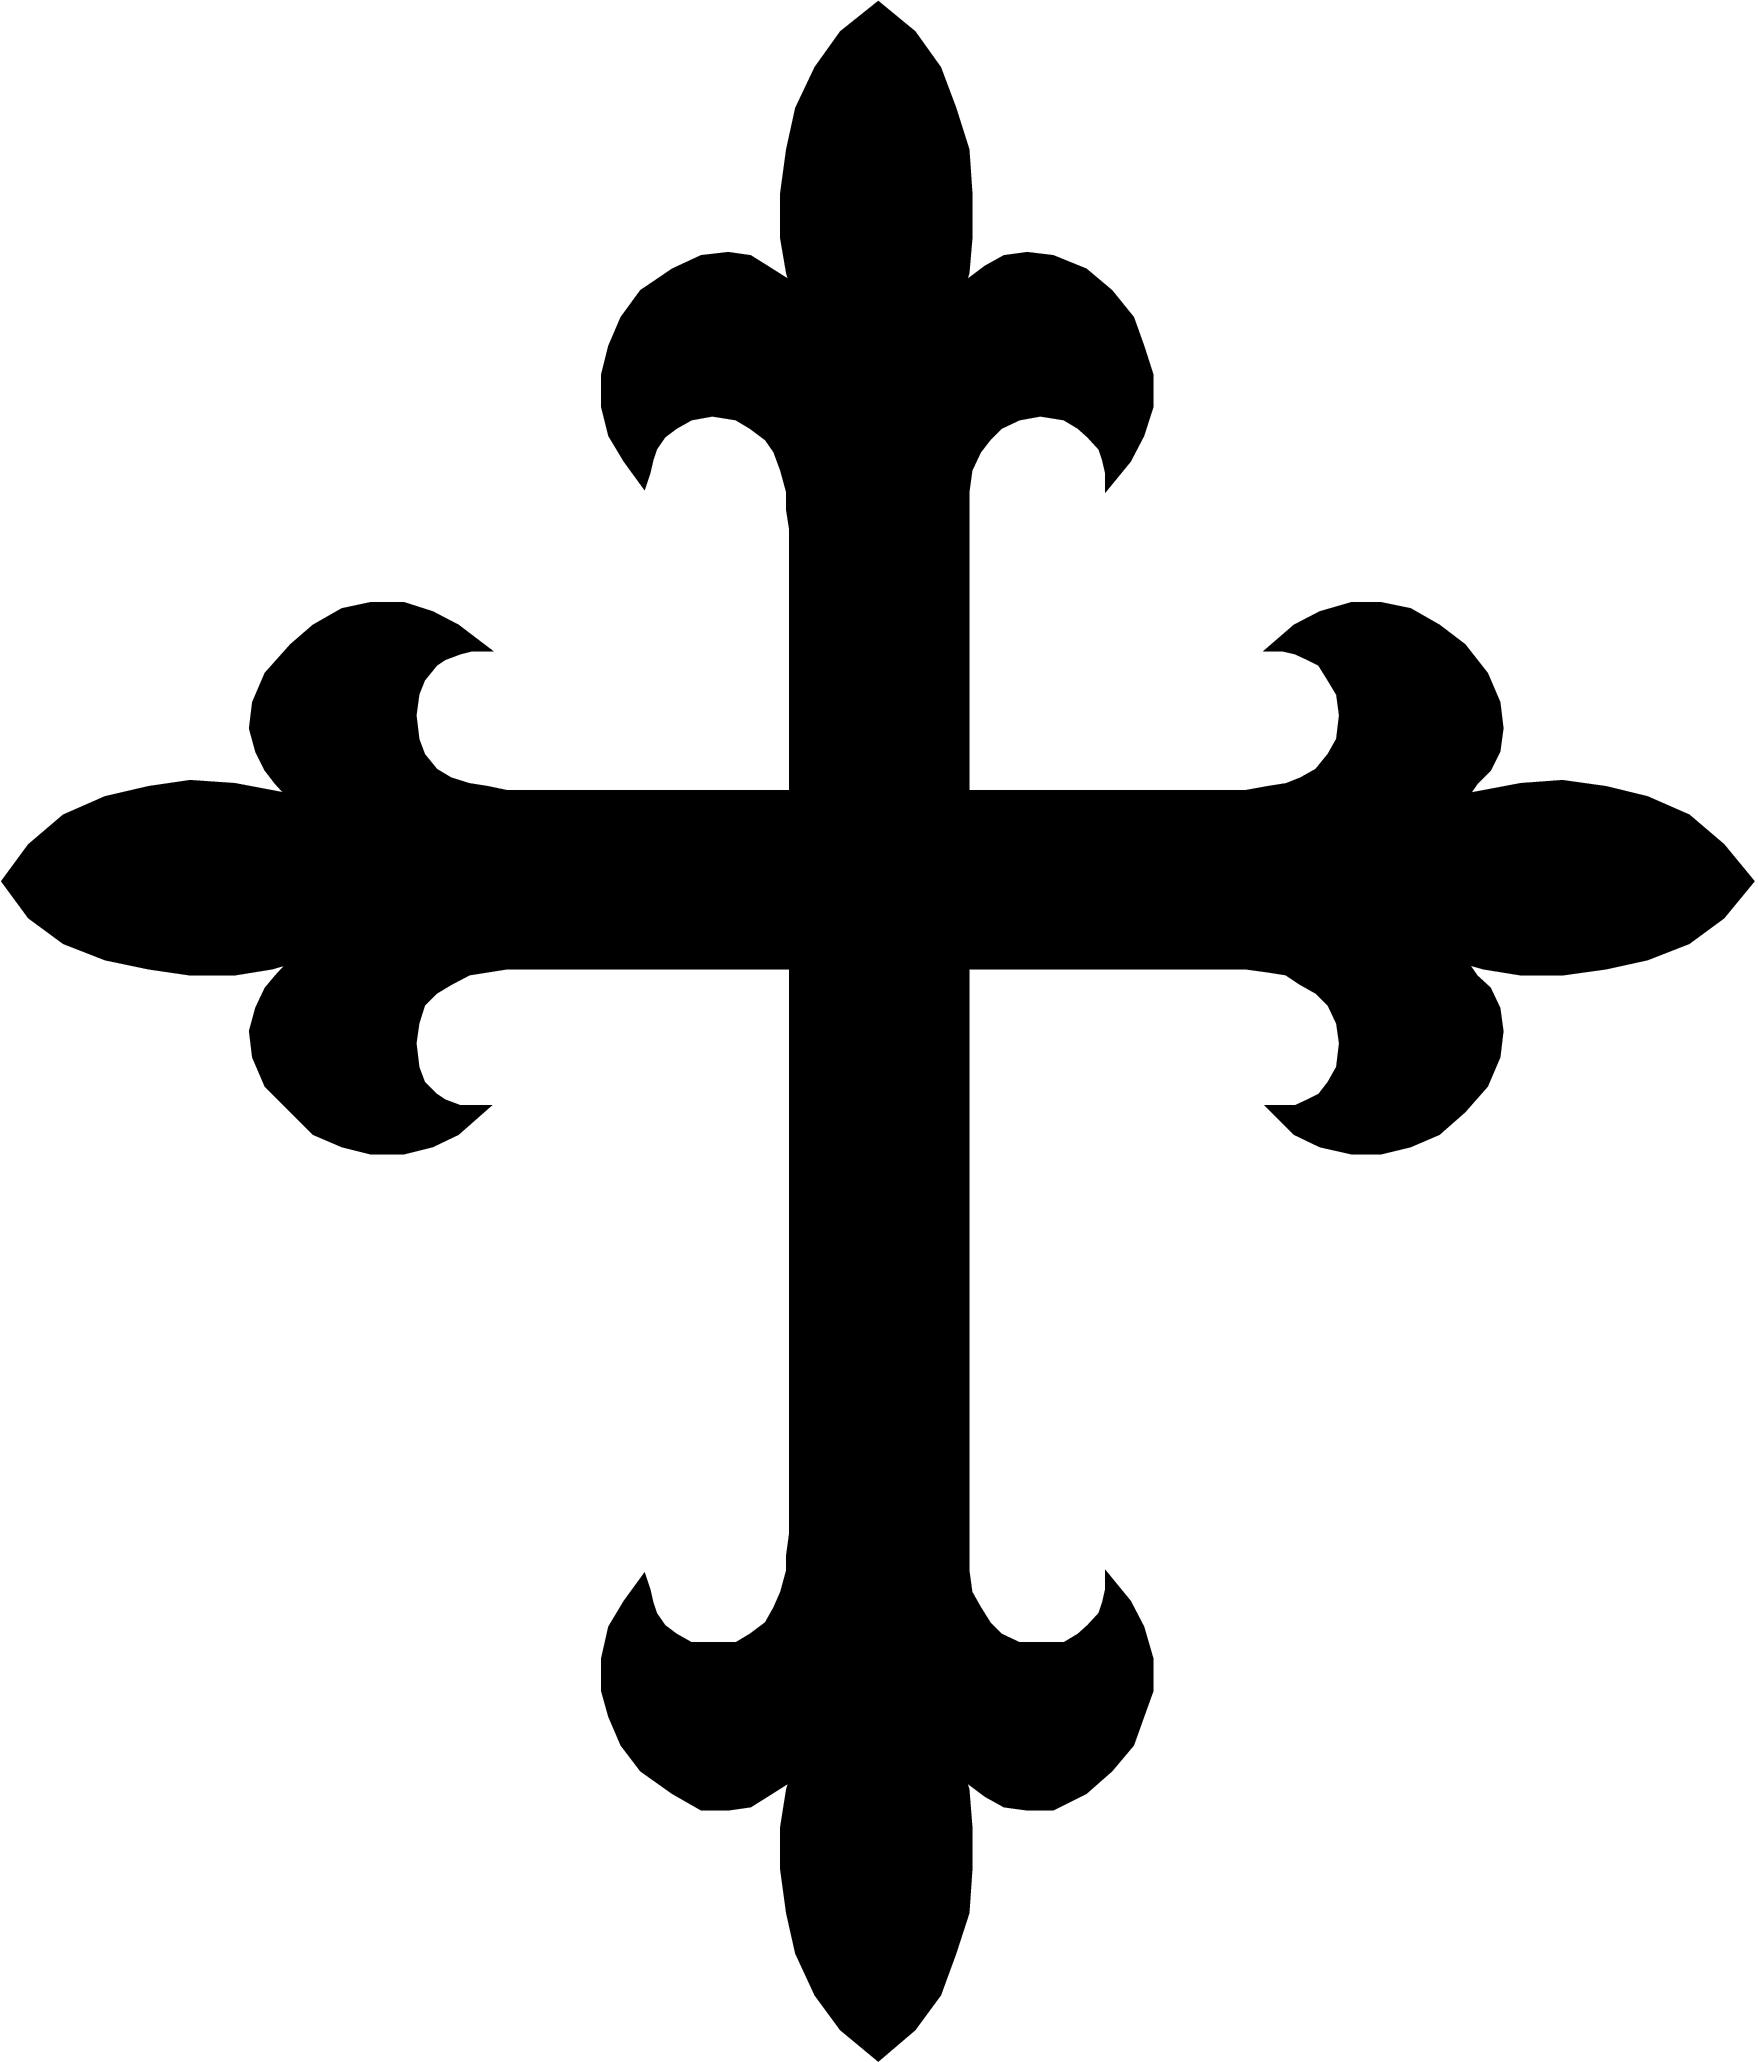 banner free download White wooden clip art. Cross clipart black